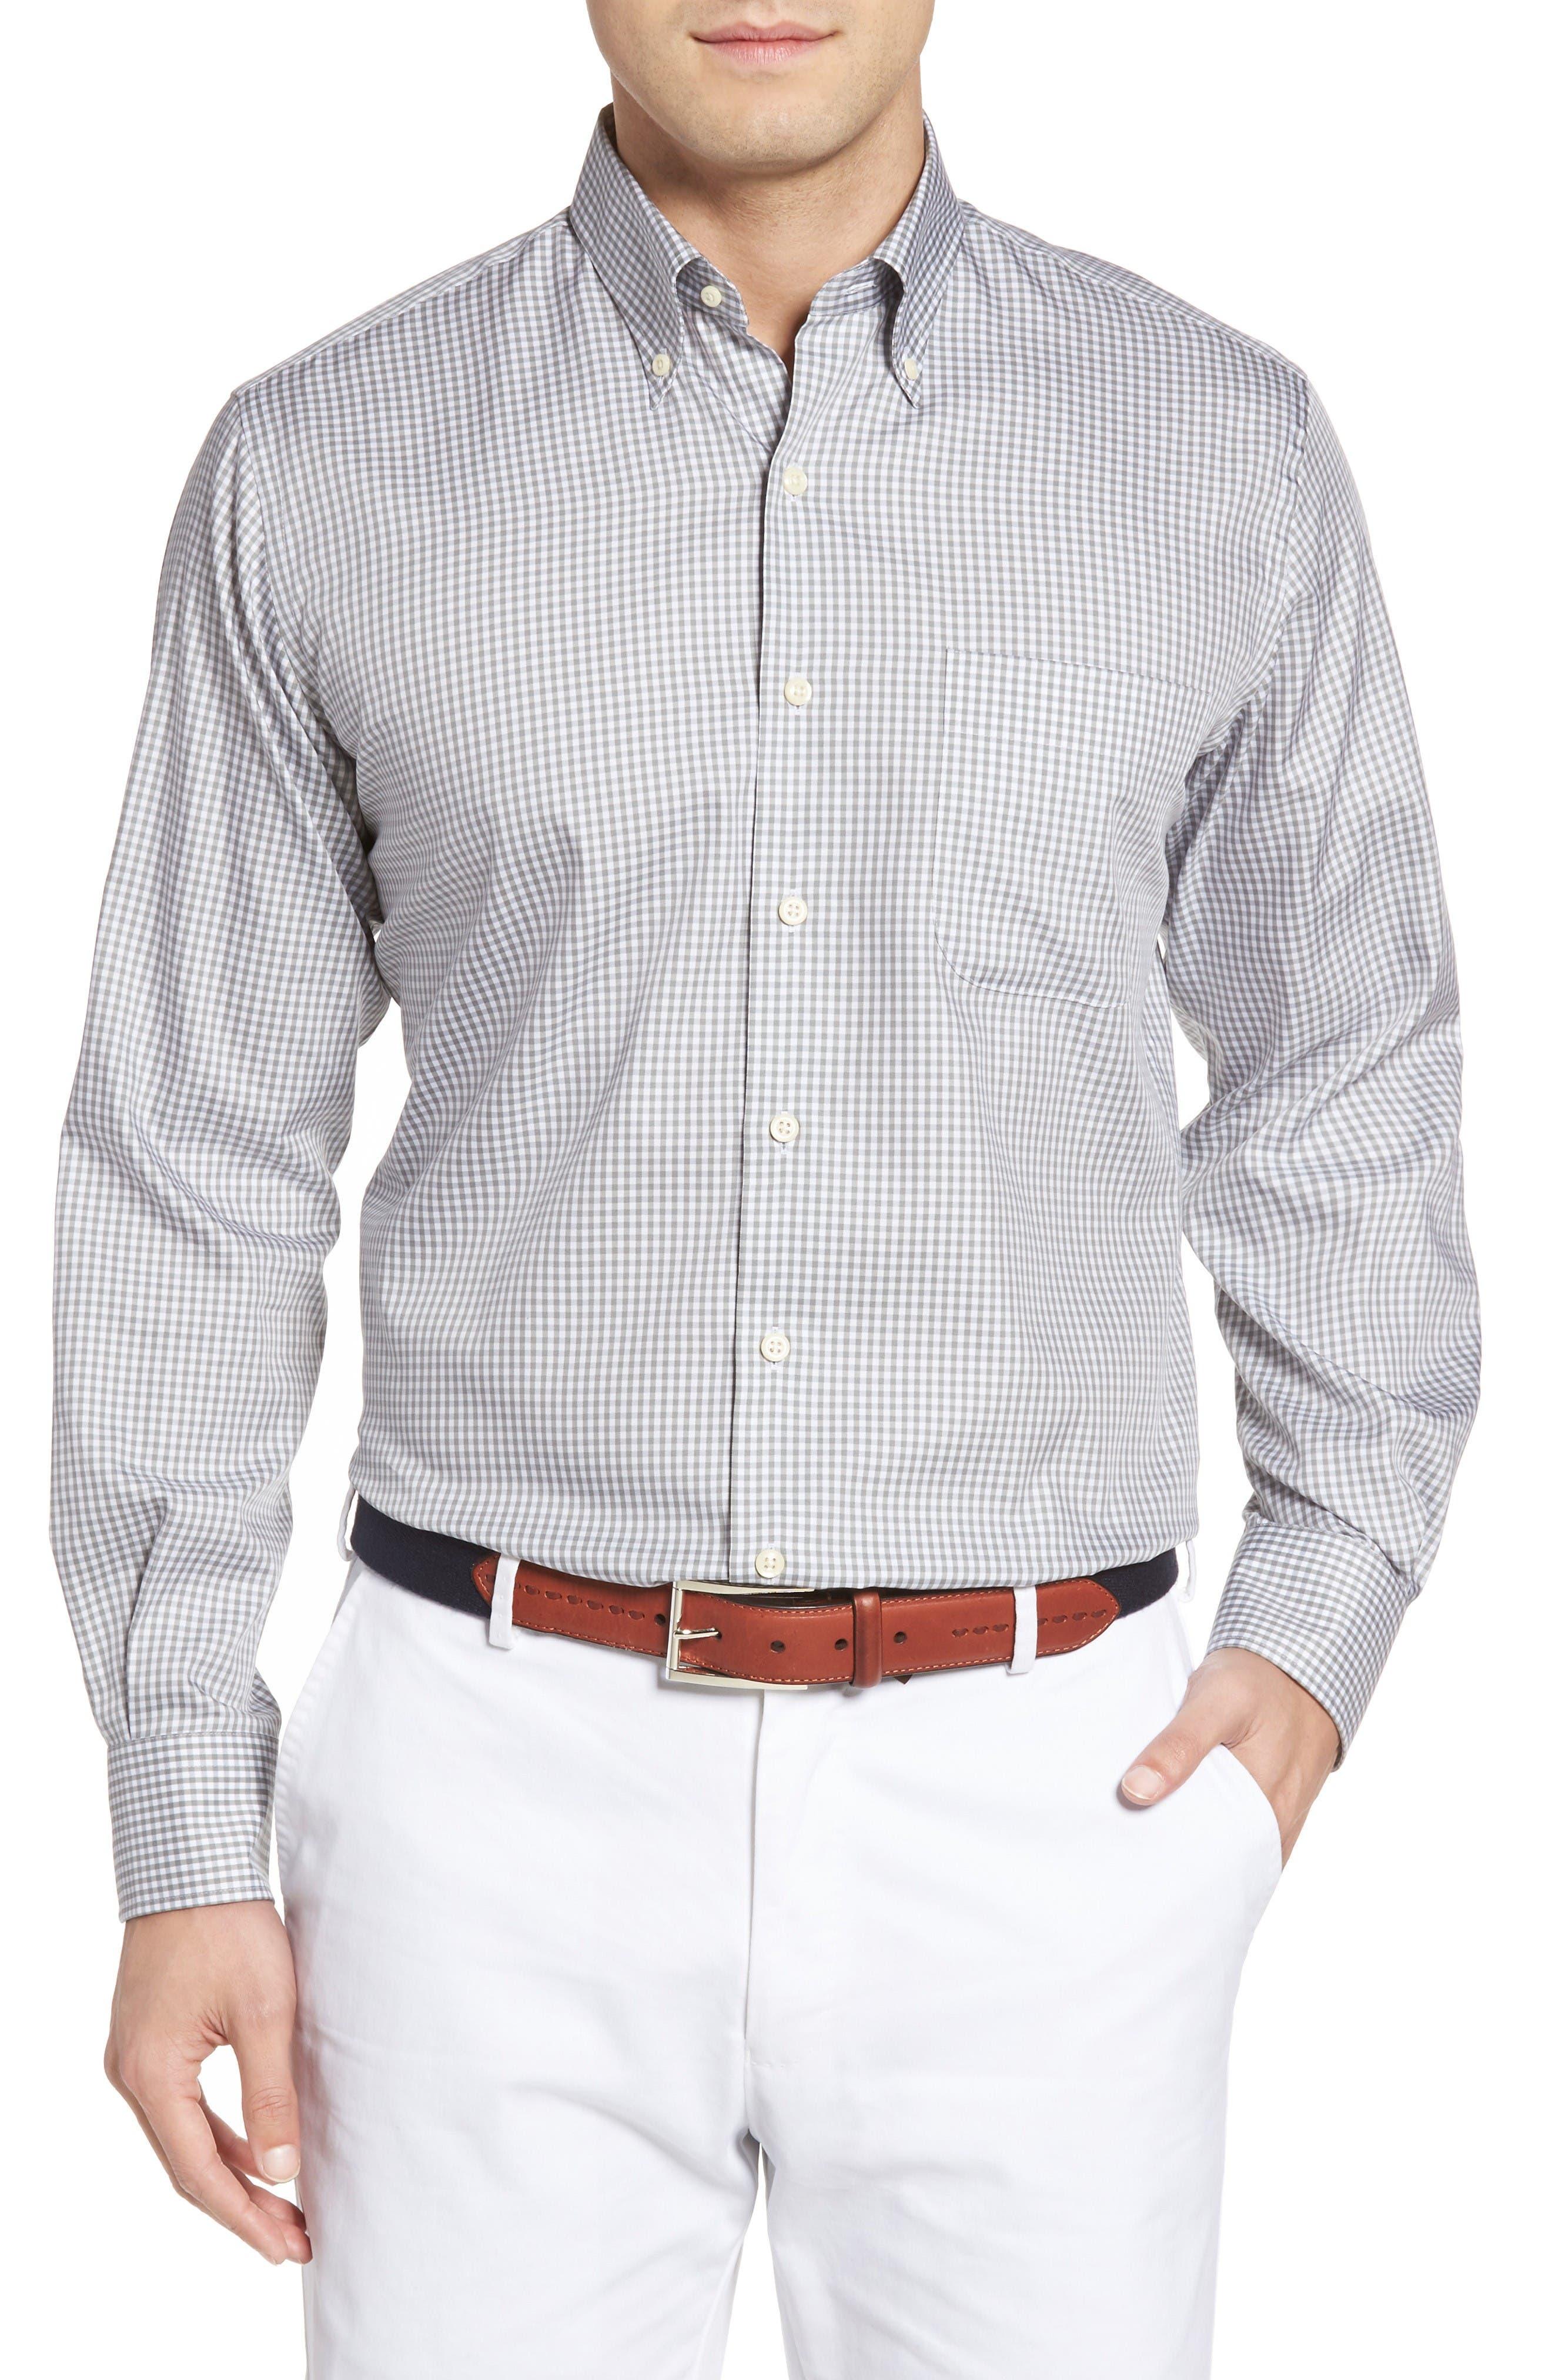 Alternate Image 1 Selected - Peter Millar Crown Soft Gingham Regular Fit Sport Shirt